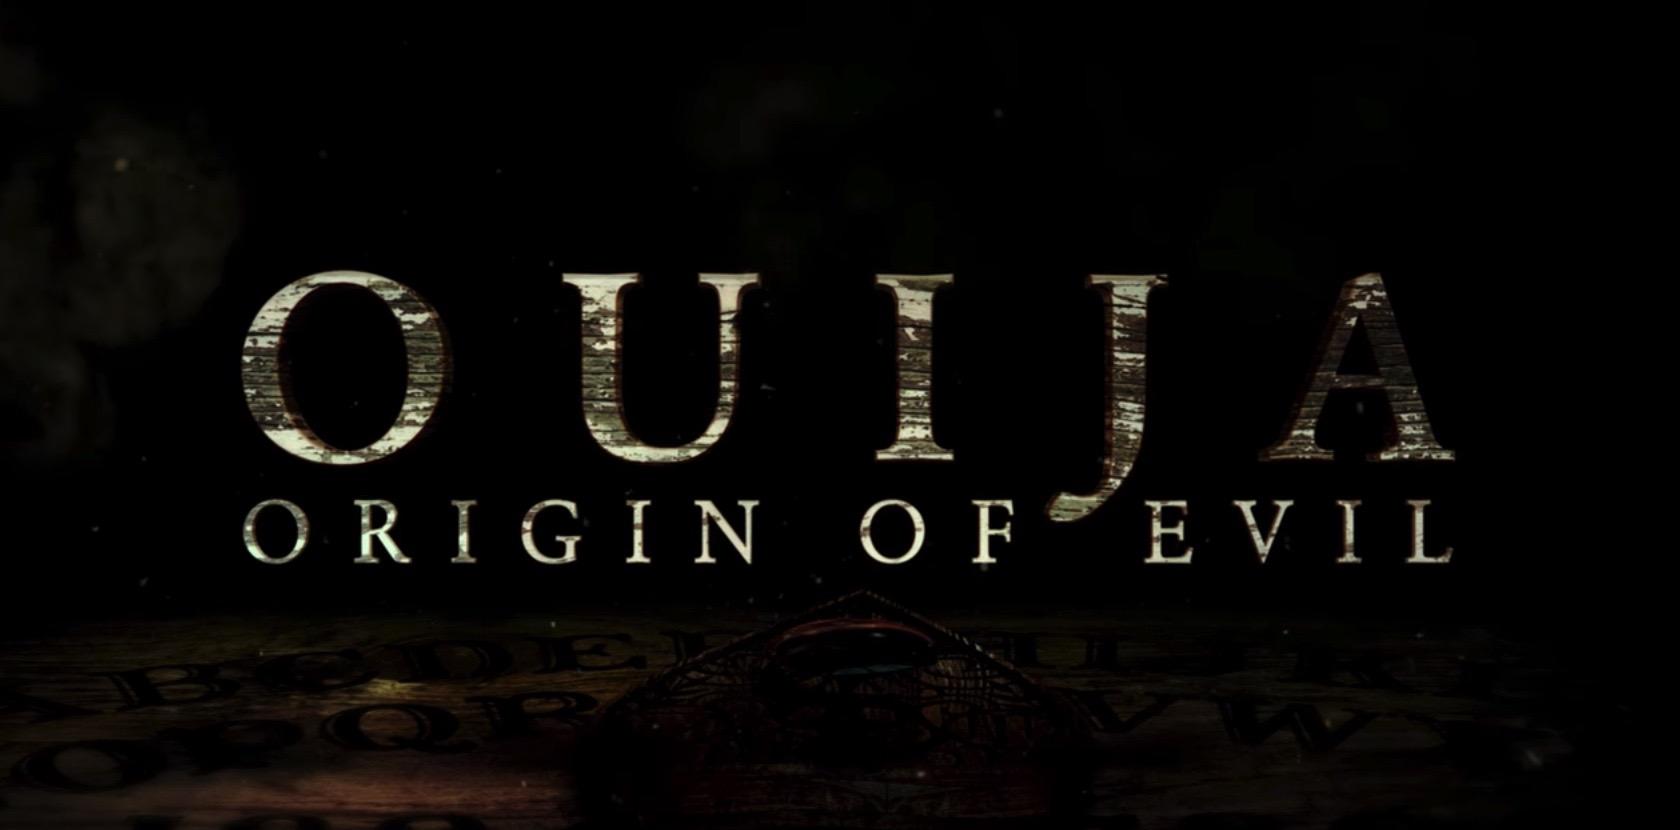 Ouija Origin of Evil (2016)dvdplanetstorepk